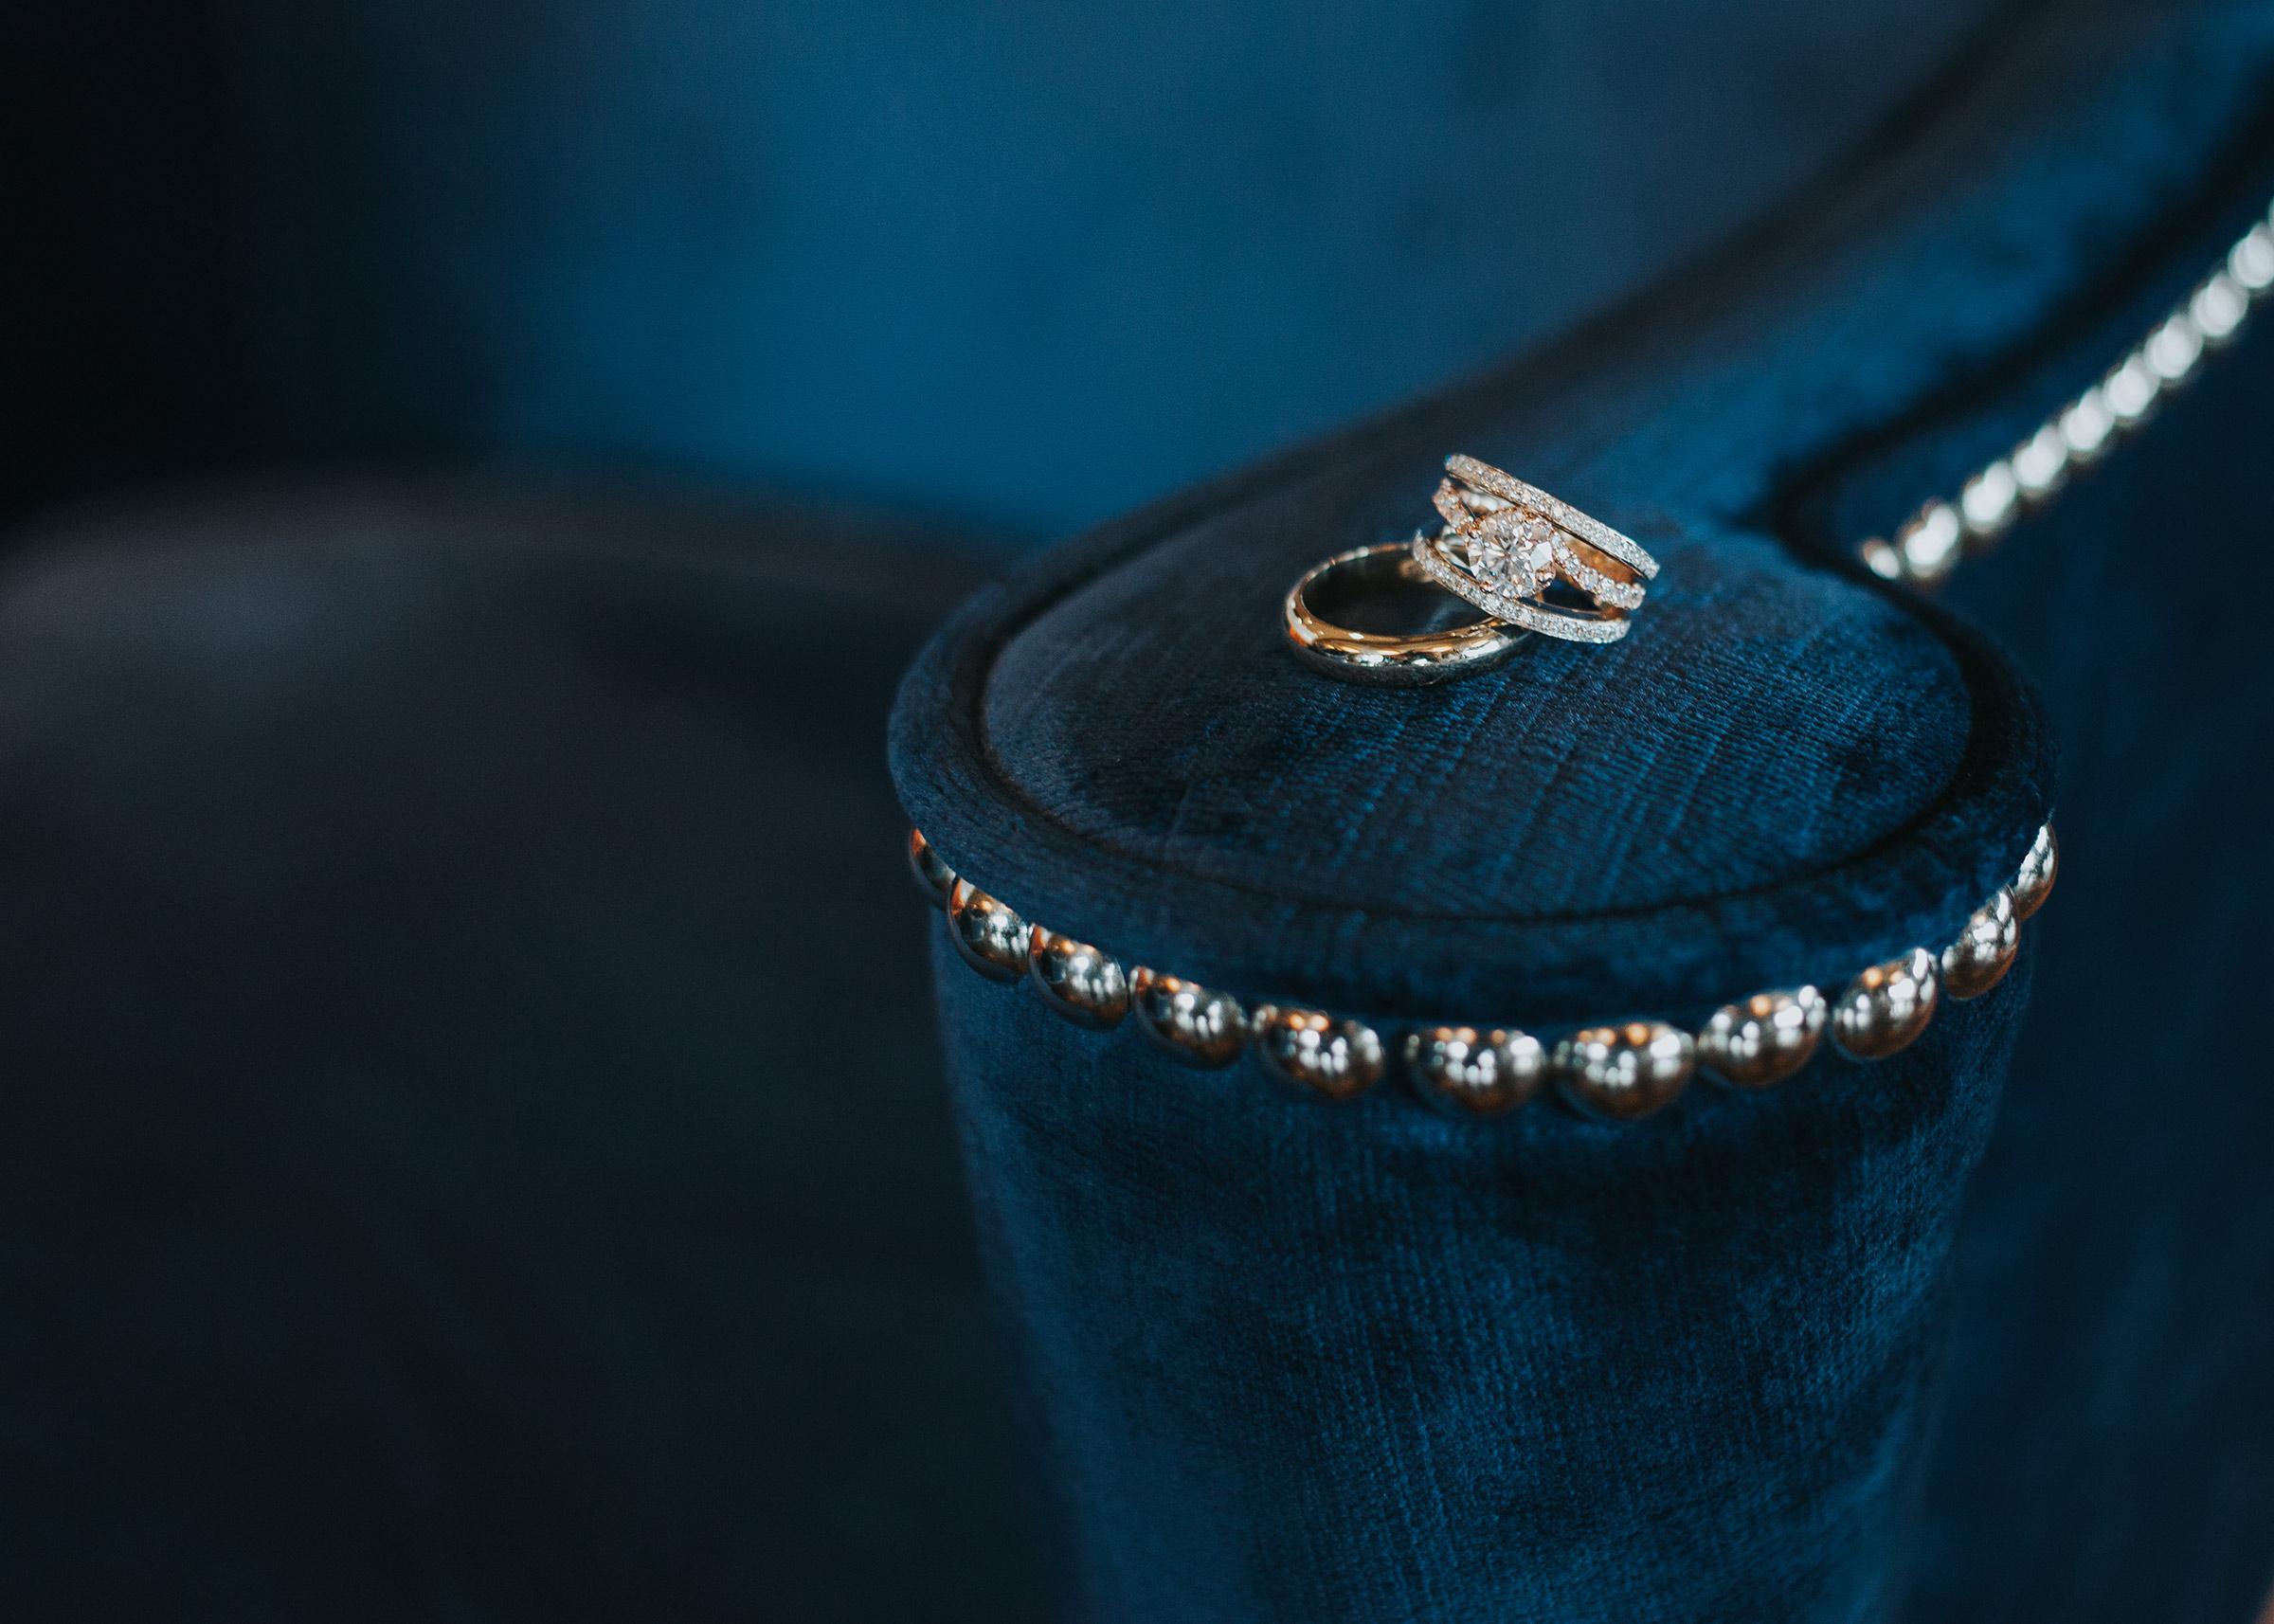 wedding-rings-detail-shot-desmoines-iowa-ac-hotel-raelyn-ramey-photography.jpg